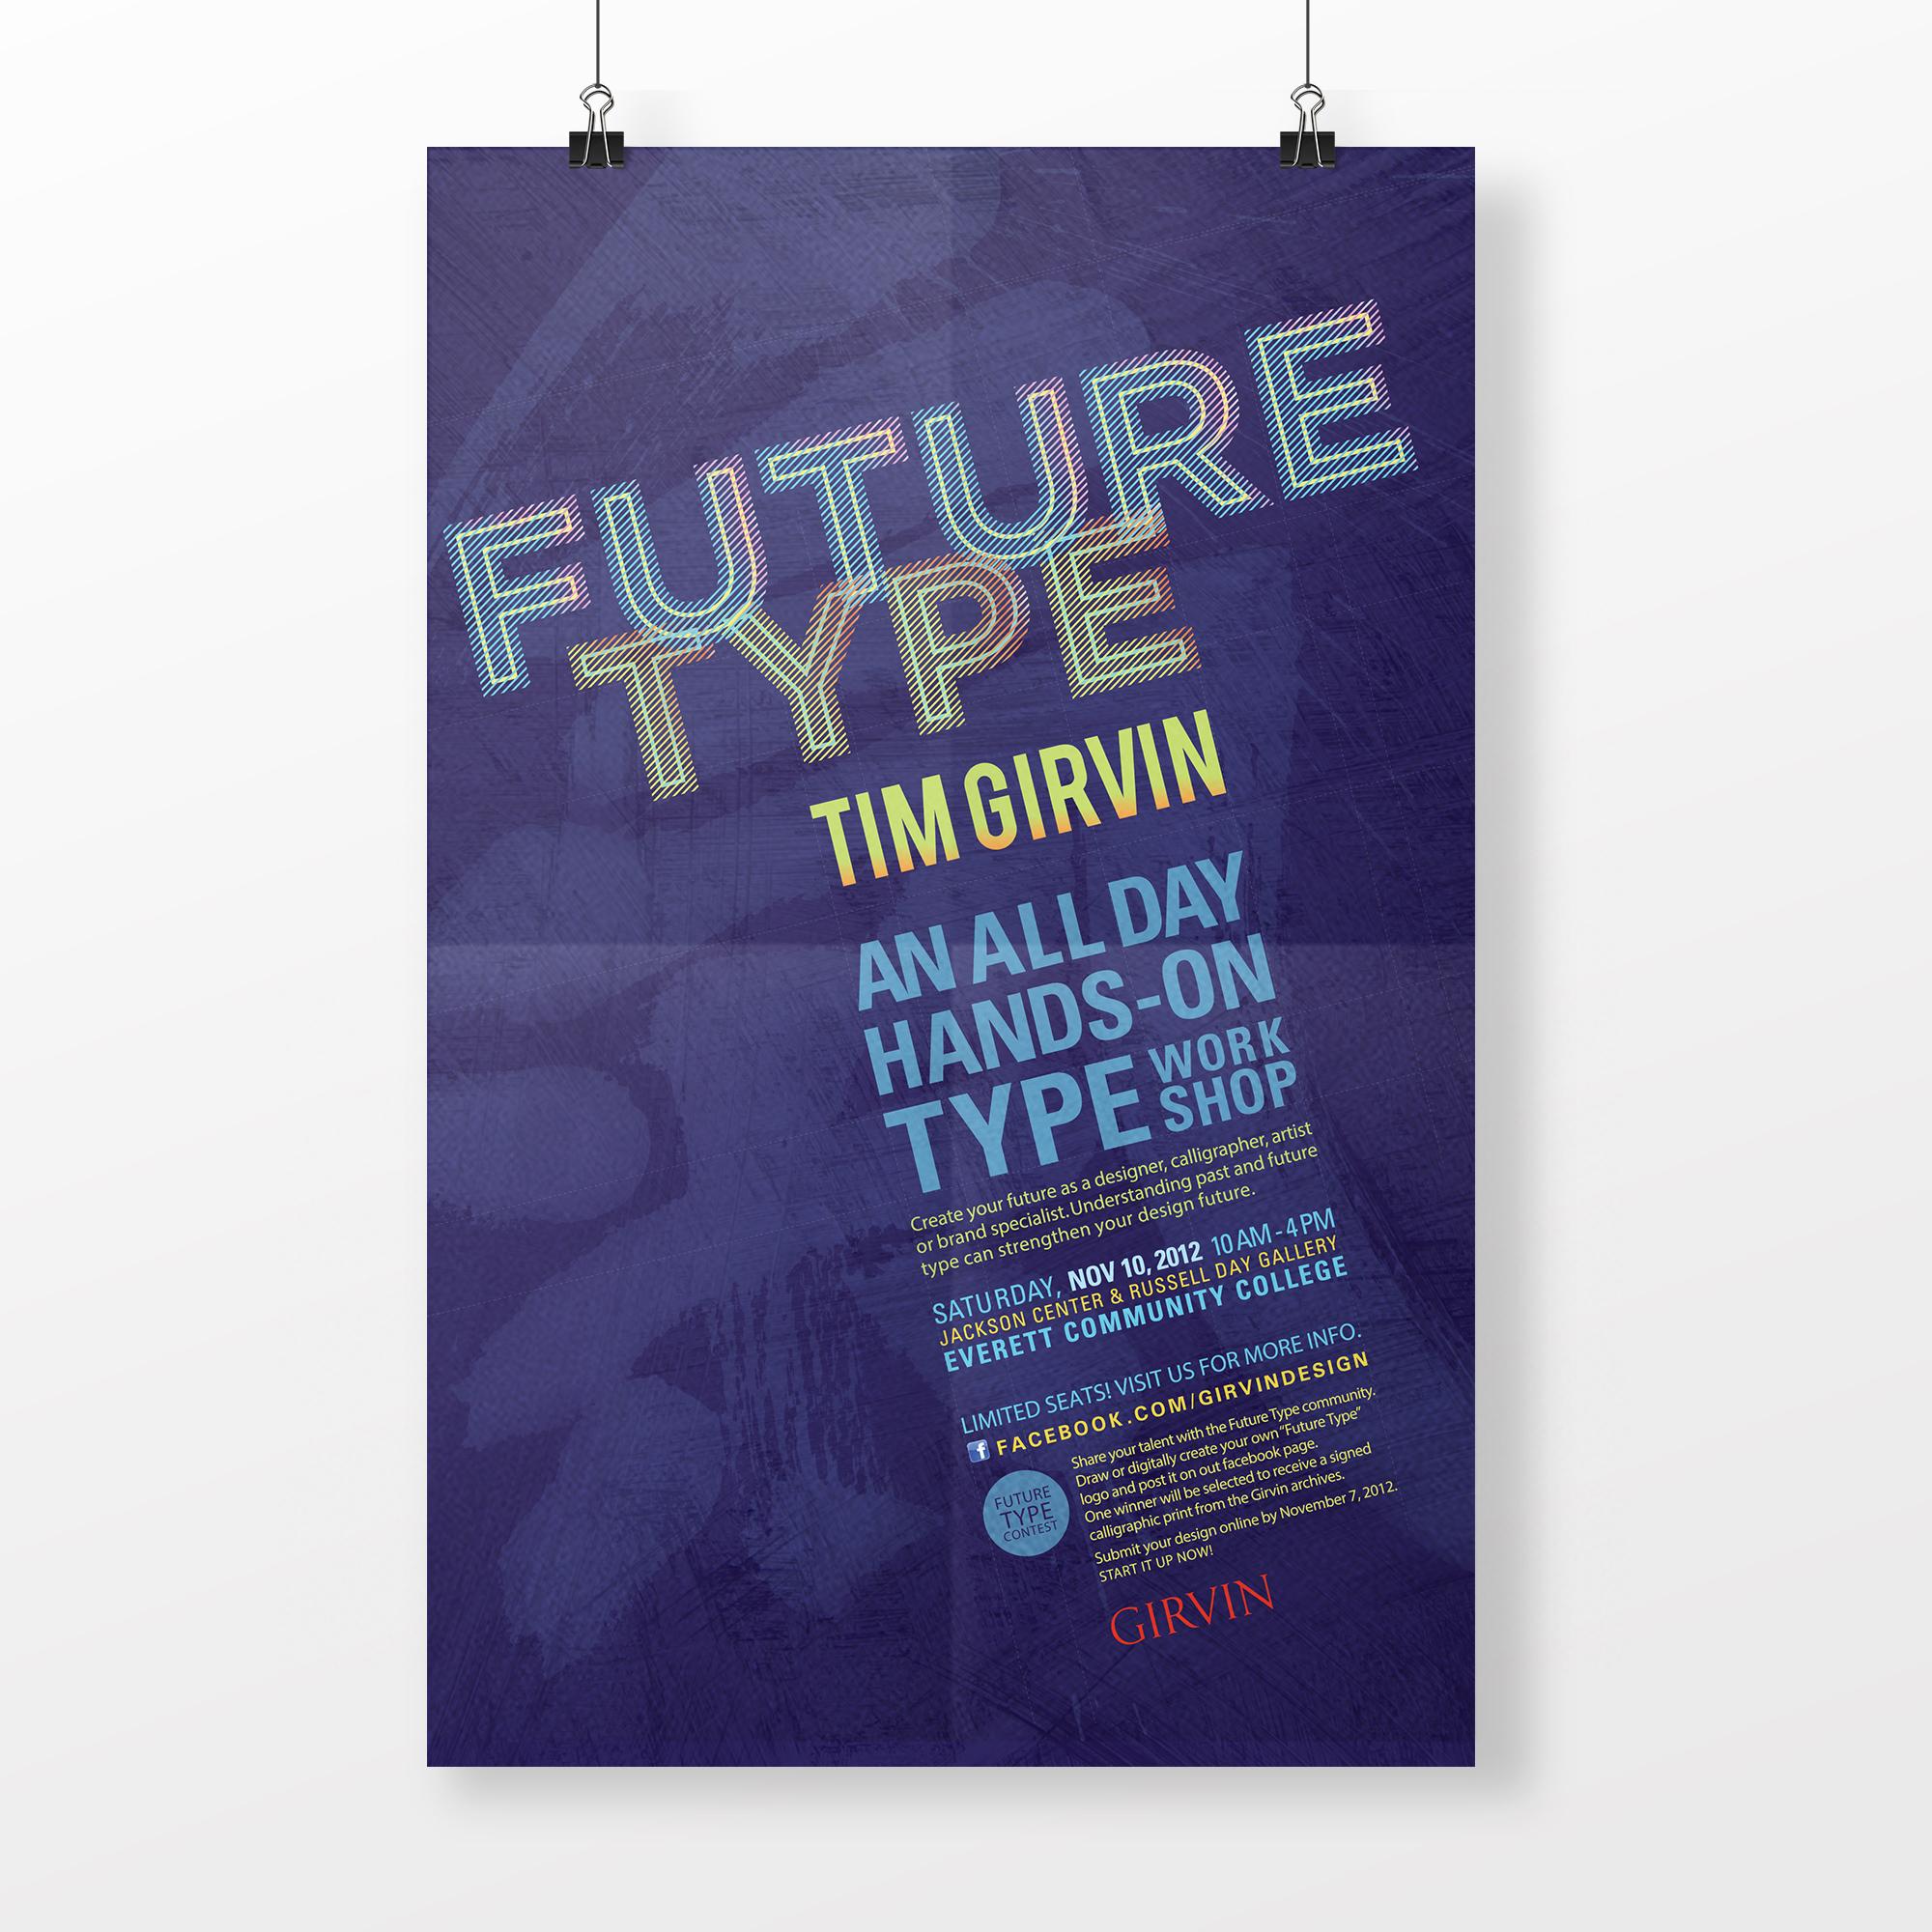 Tim Girvin's Future Type Poster